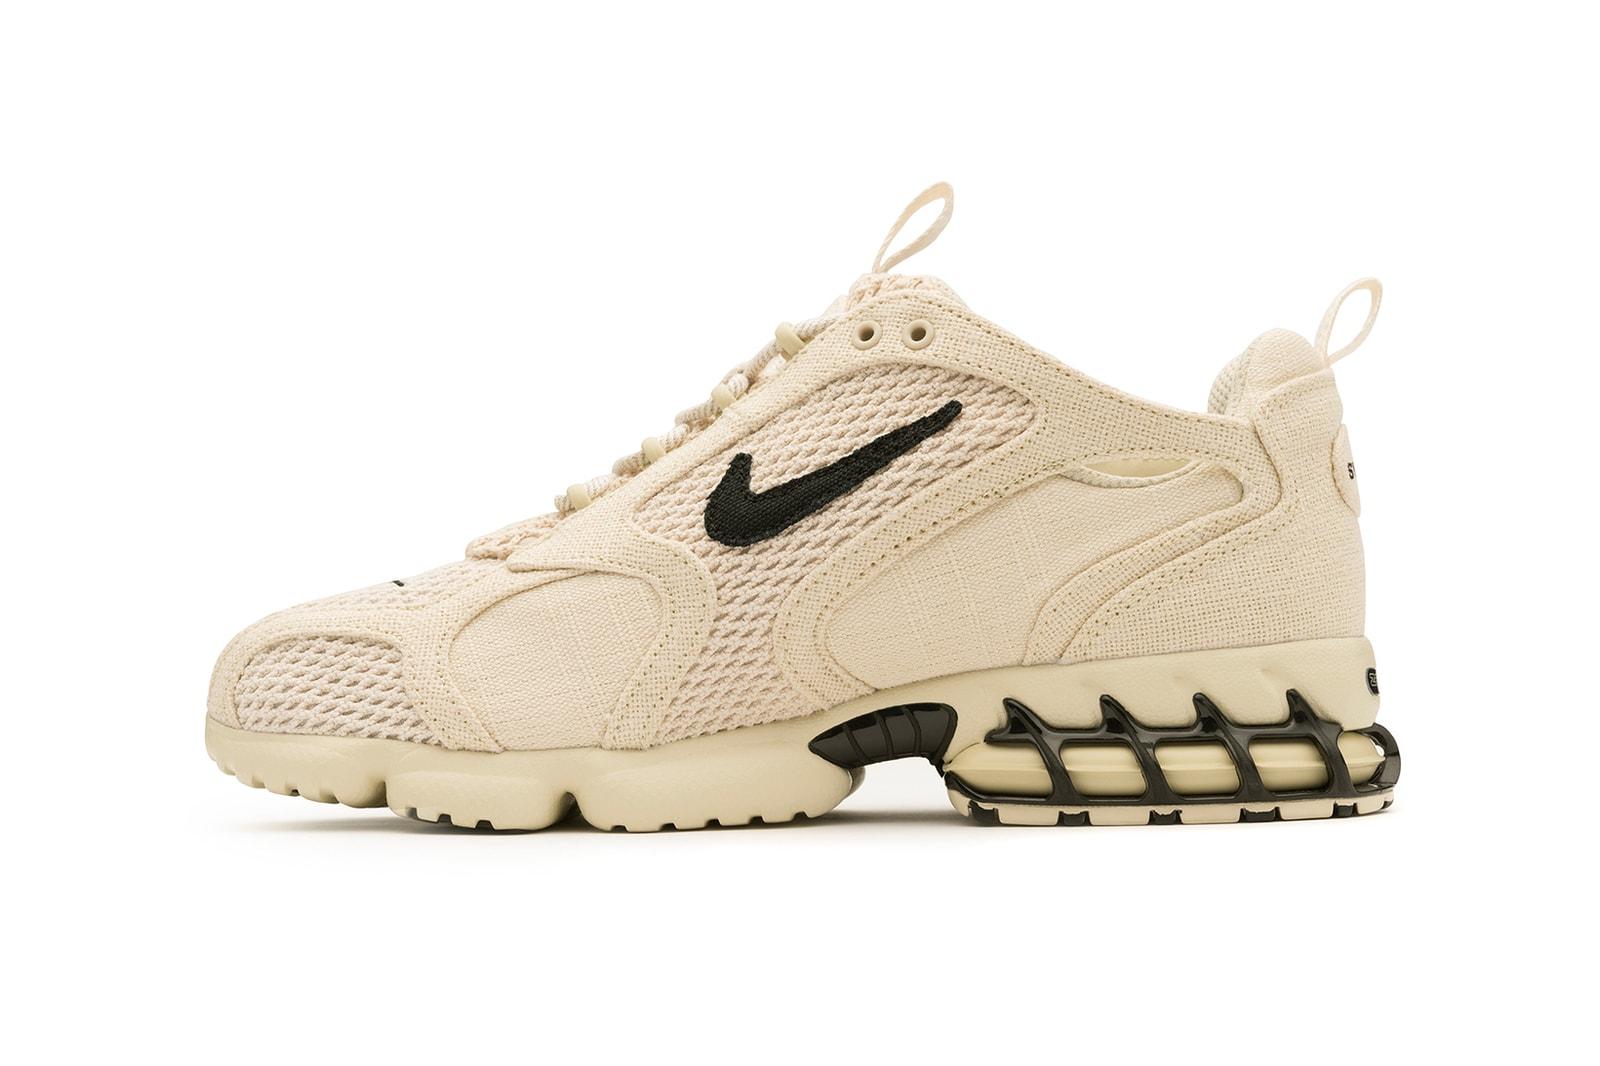 nike stussy collaborazione air zoom spiridon in gabbia 2 sneakers beige nero argento calzature scarpe sneakerhead